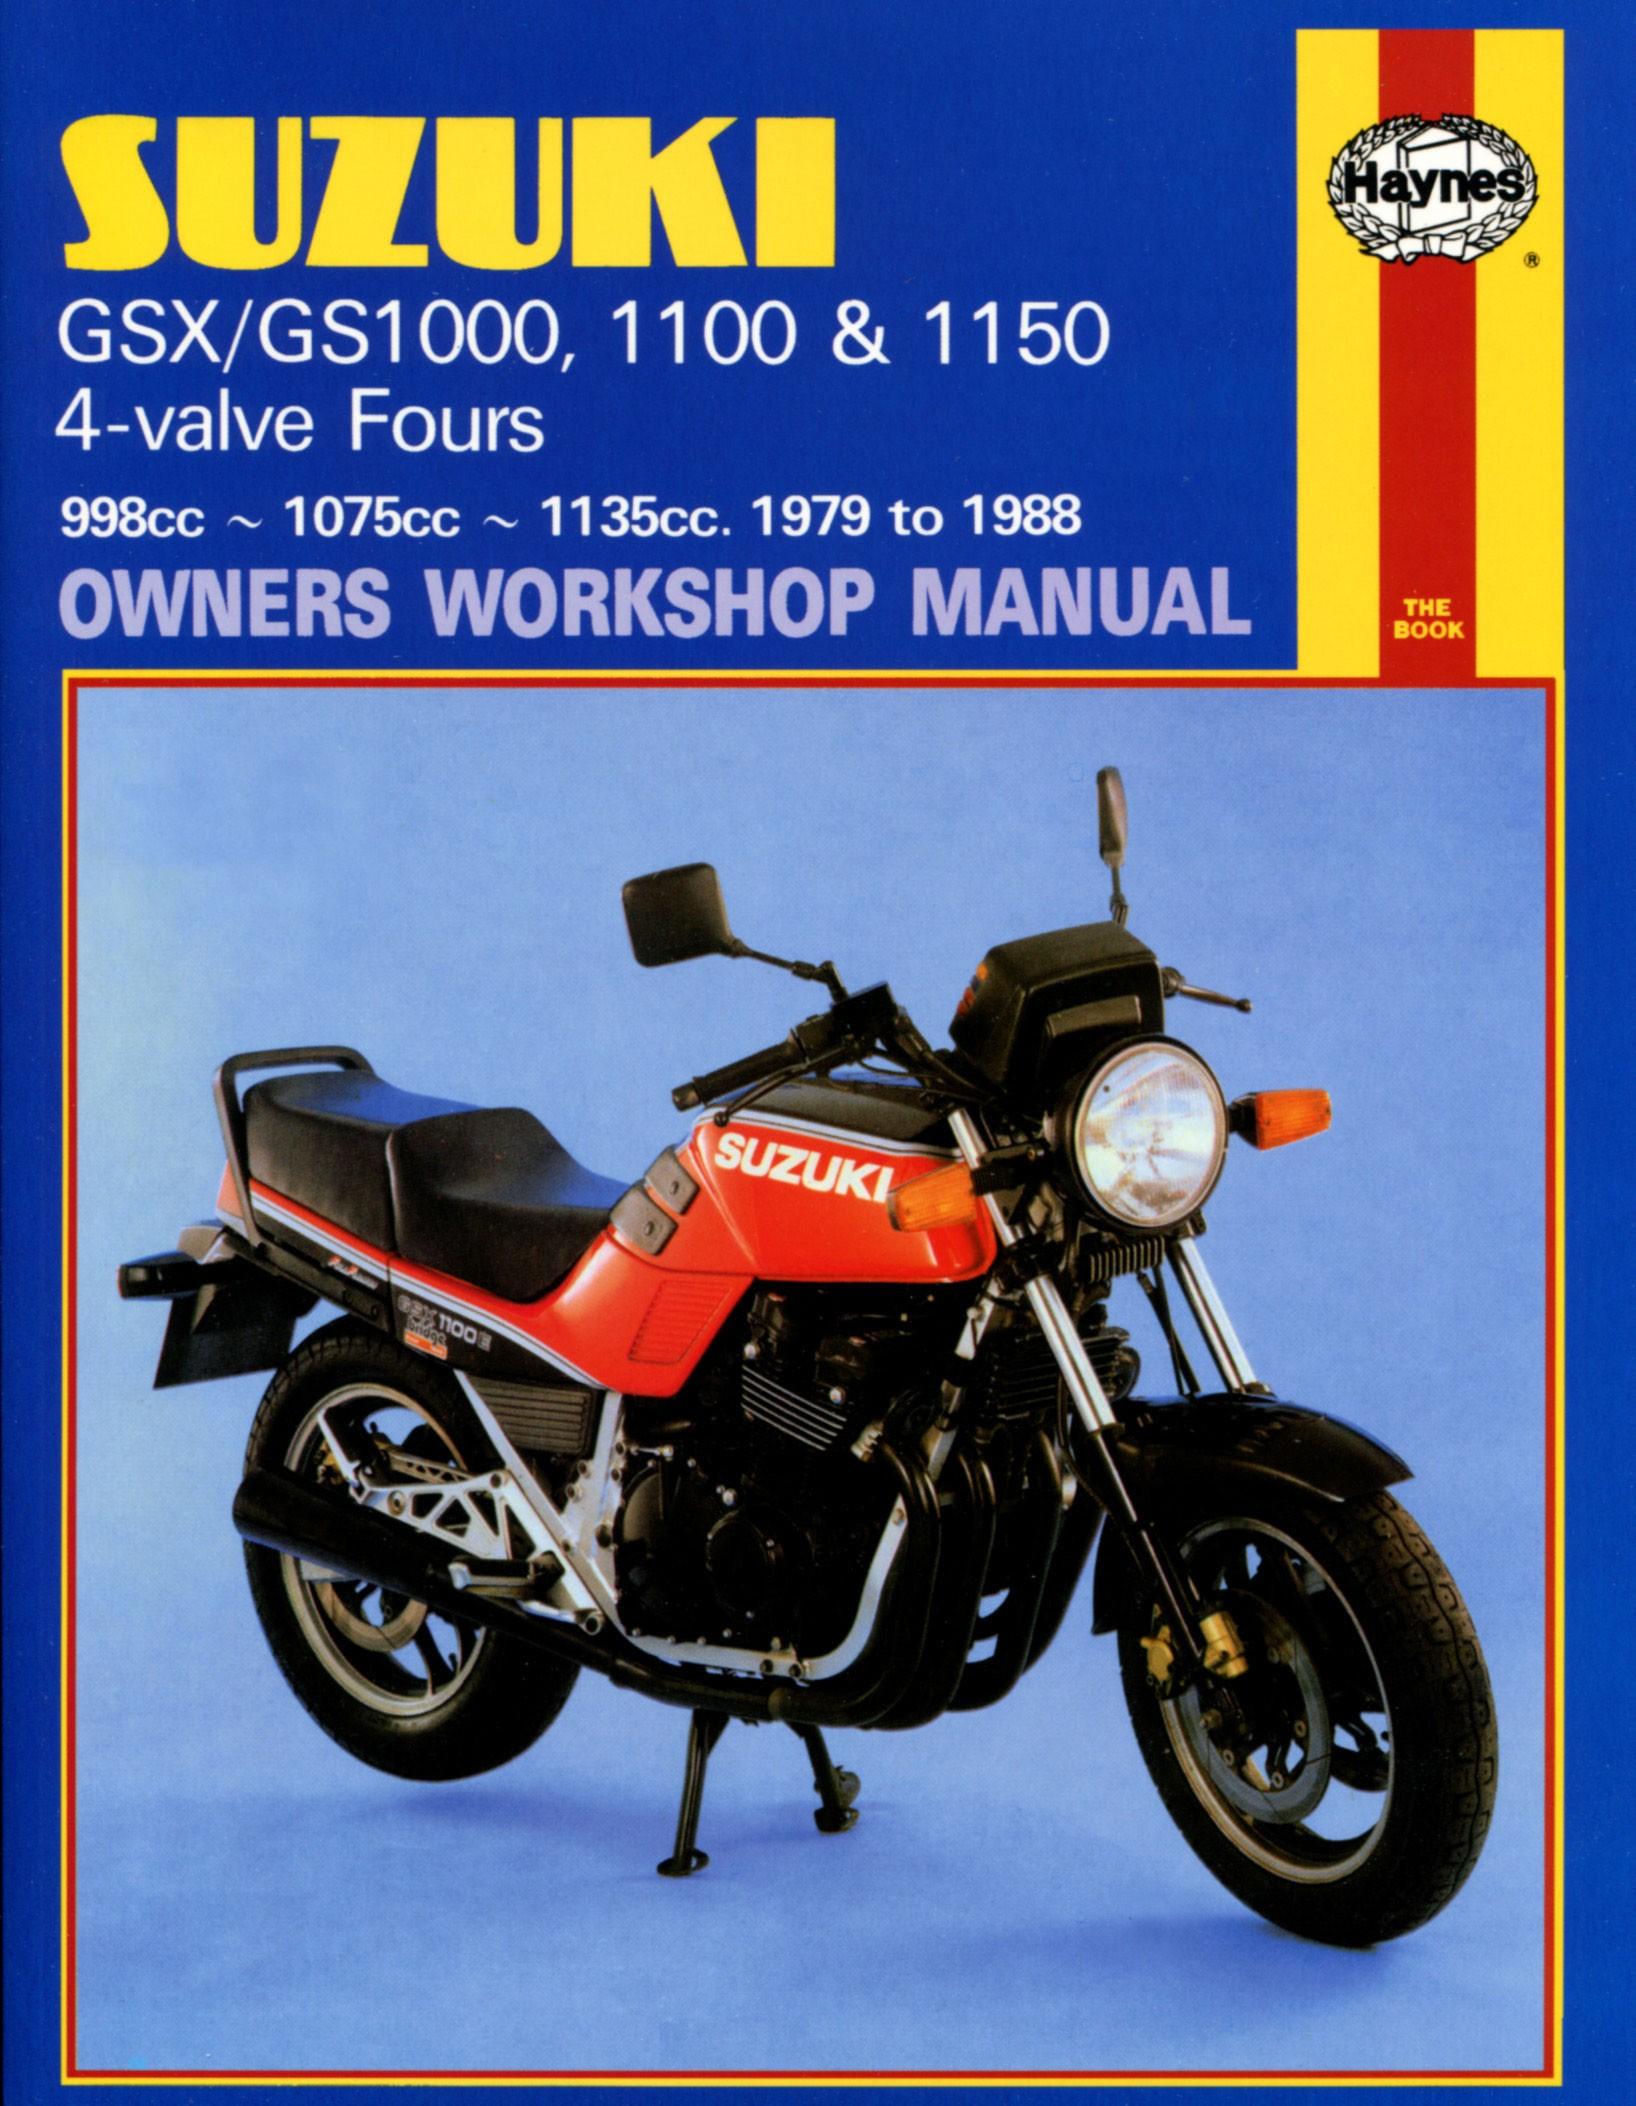 HAYNES Repair Manual - Suzuki GSX/GS1000, 1100, 1150 4-valve Fours  (1979-1988)